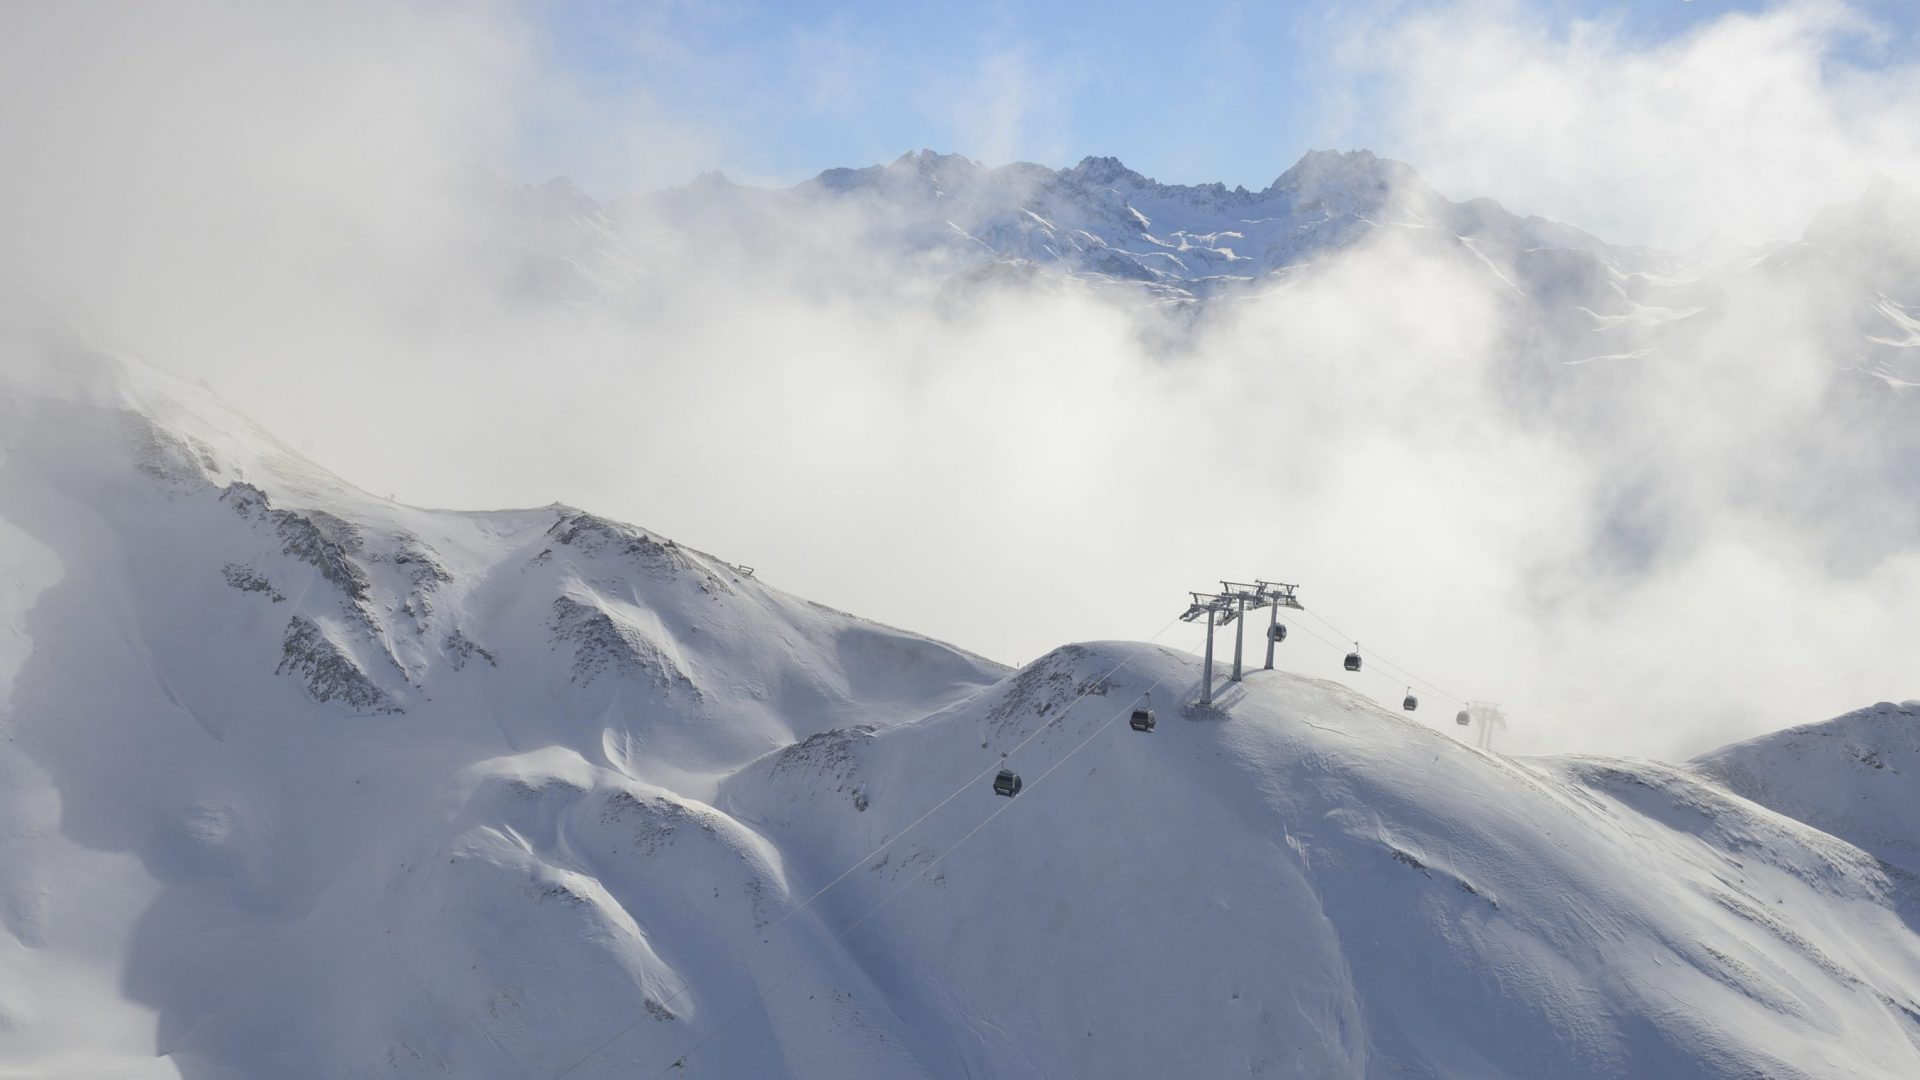 Winterurlaub in Vorarlberg, Flexenbahn, Lech Zürs am Arlberg (c) Ski Arlberg